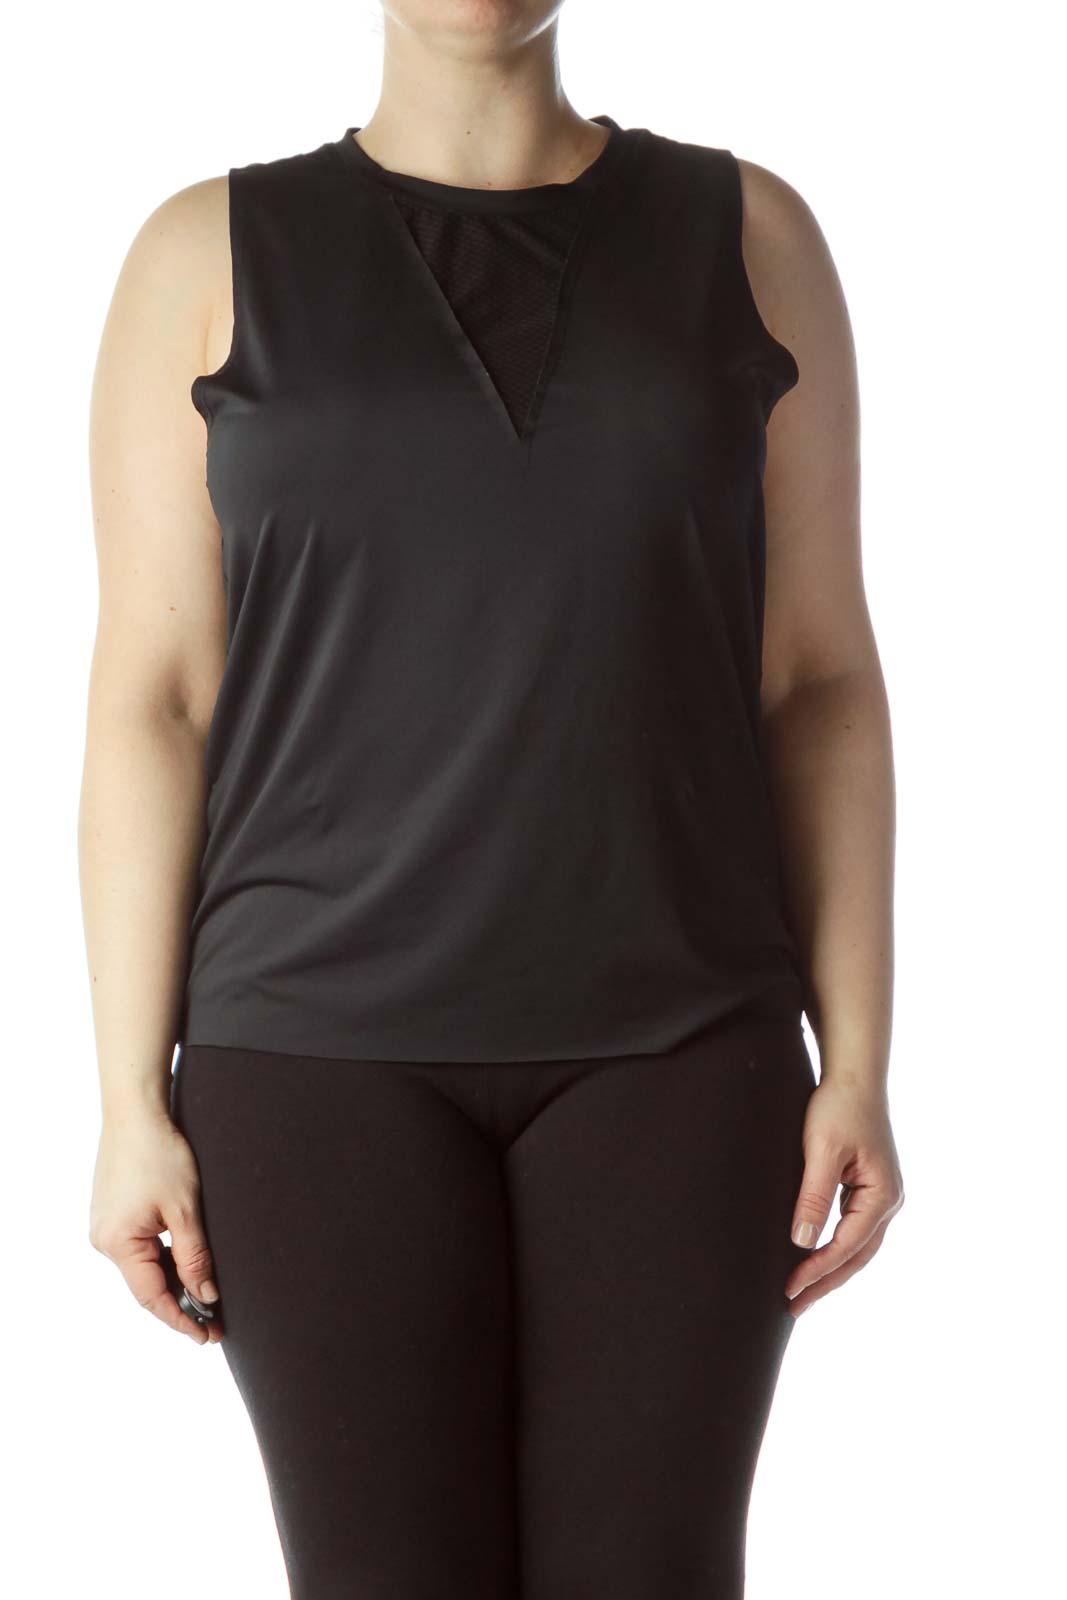 Black Round Neck Sleeveless Yoga Top